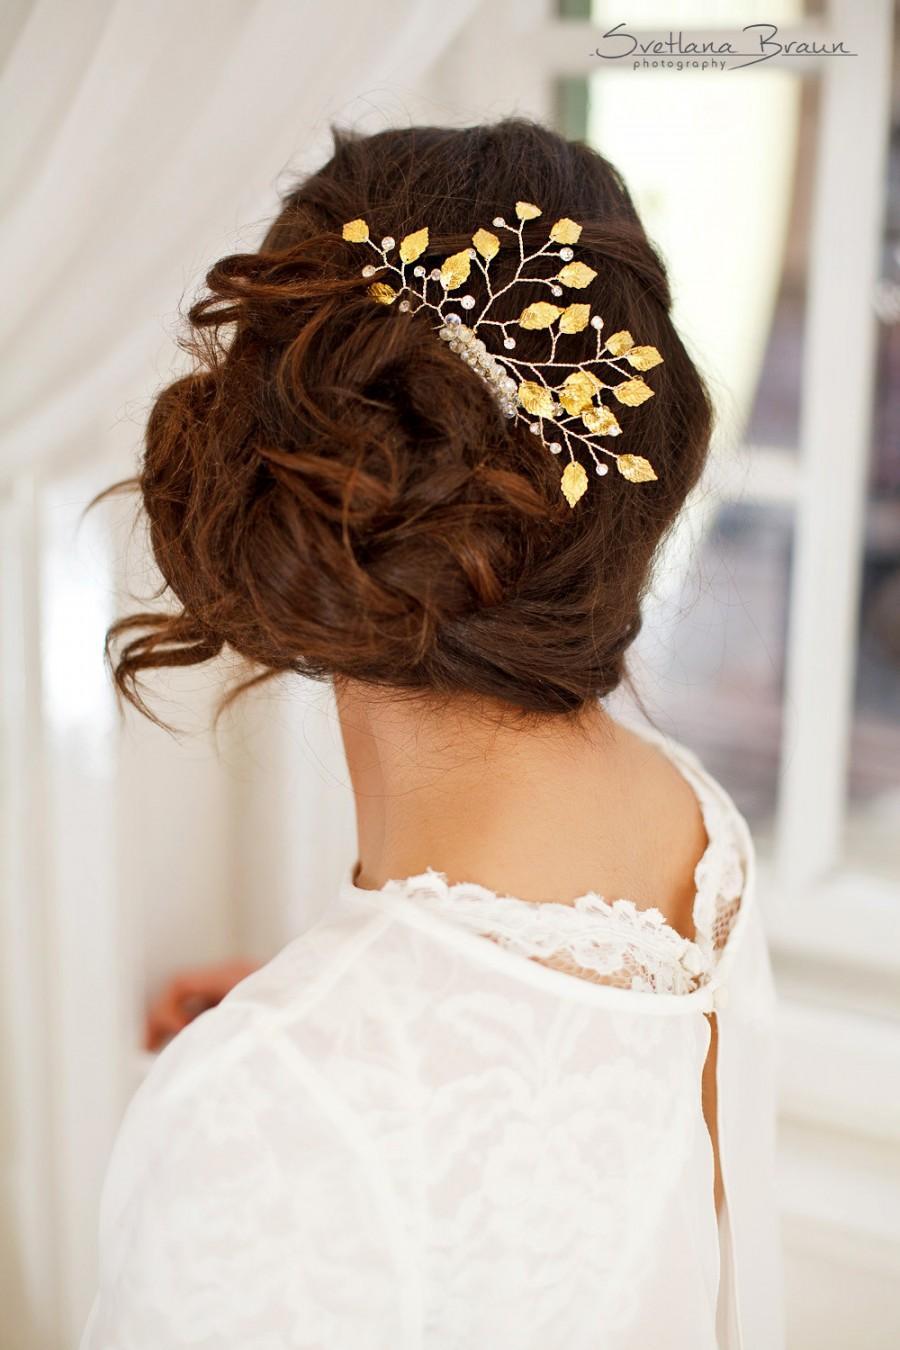 زفاف - Wedding Leaf Comb, Gold Leaves Bridal Comb, Rhinestone Bridal Comb, Gold Bridal Hair vine, Leaf Hair Piece, Grecian Comb, Bridal Headpiece